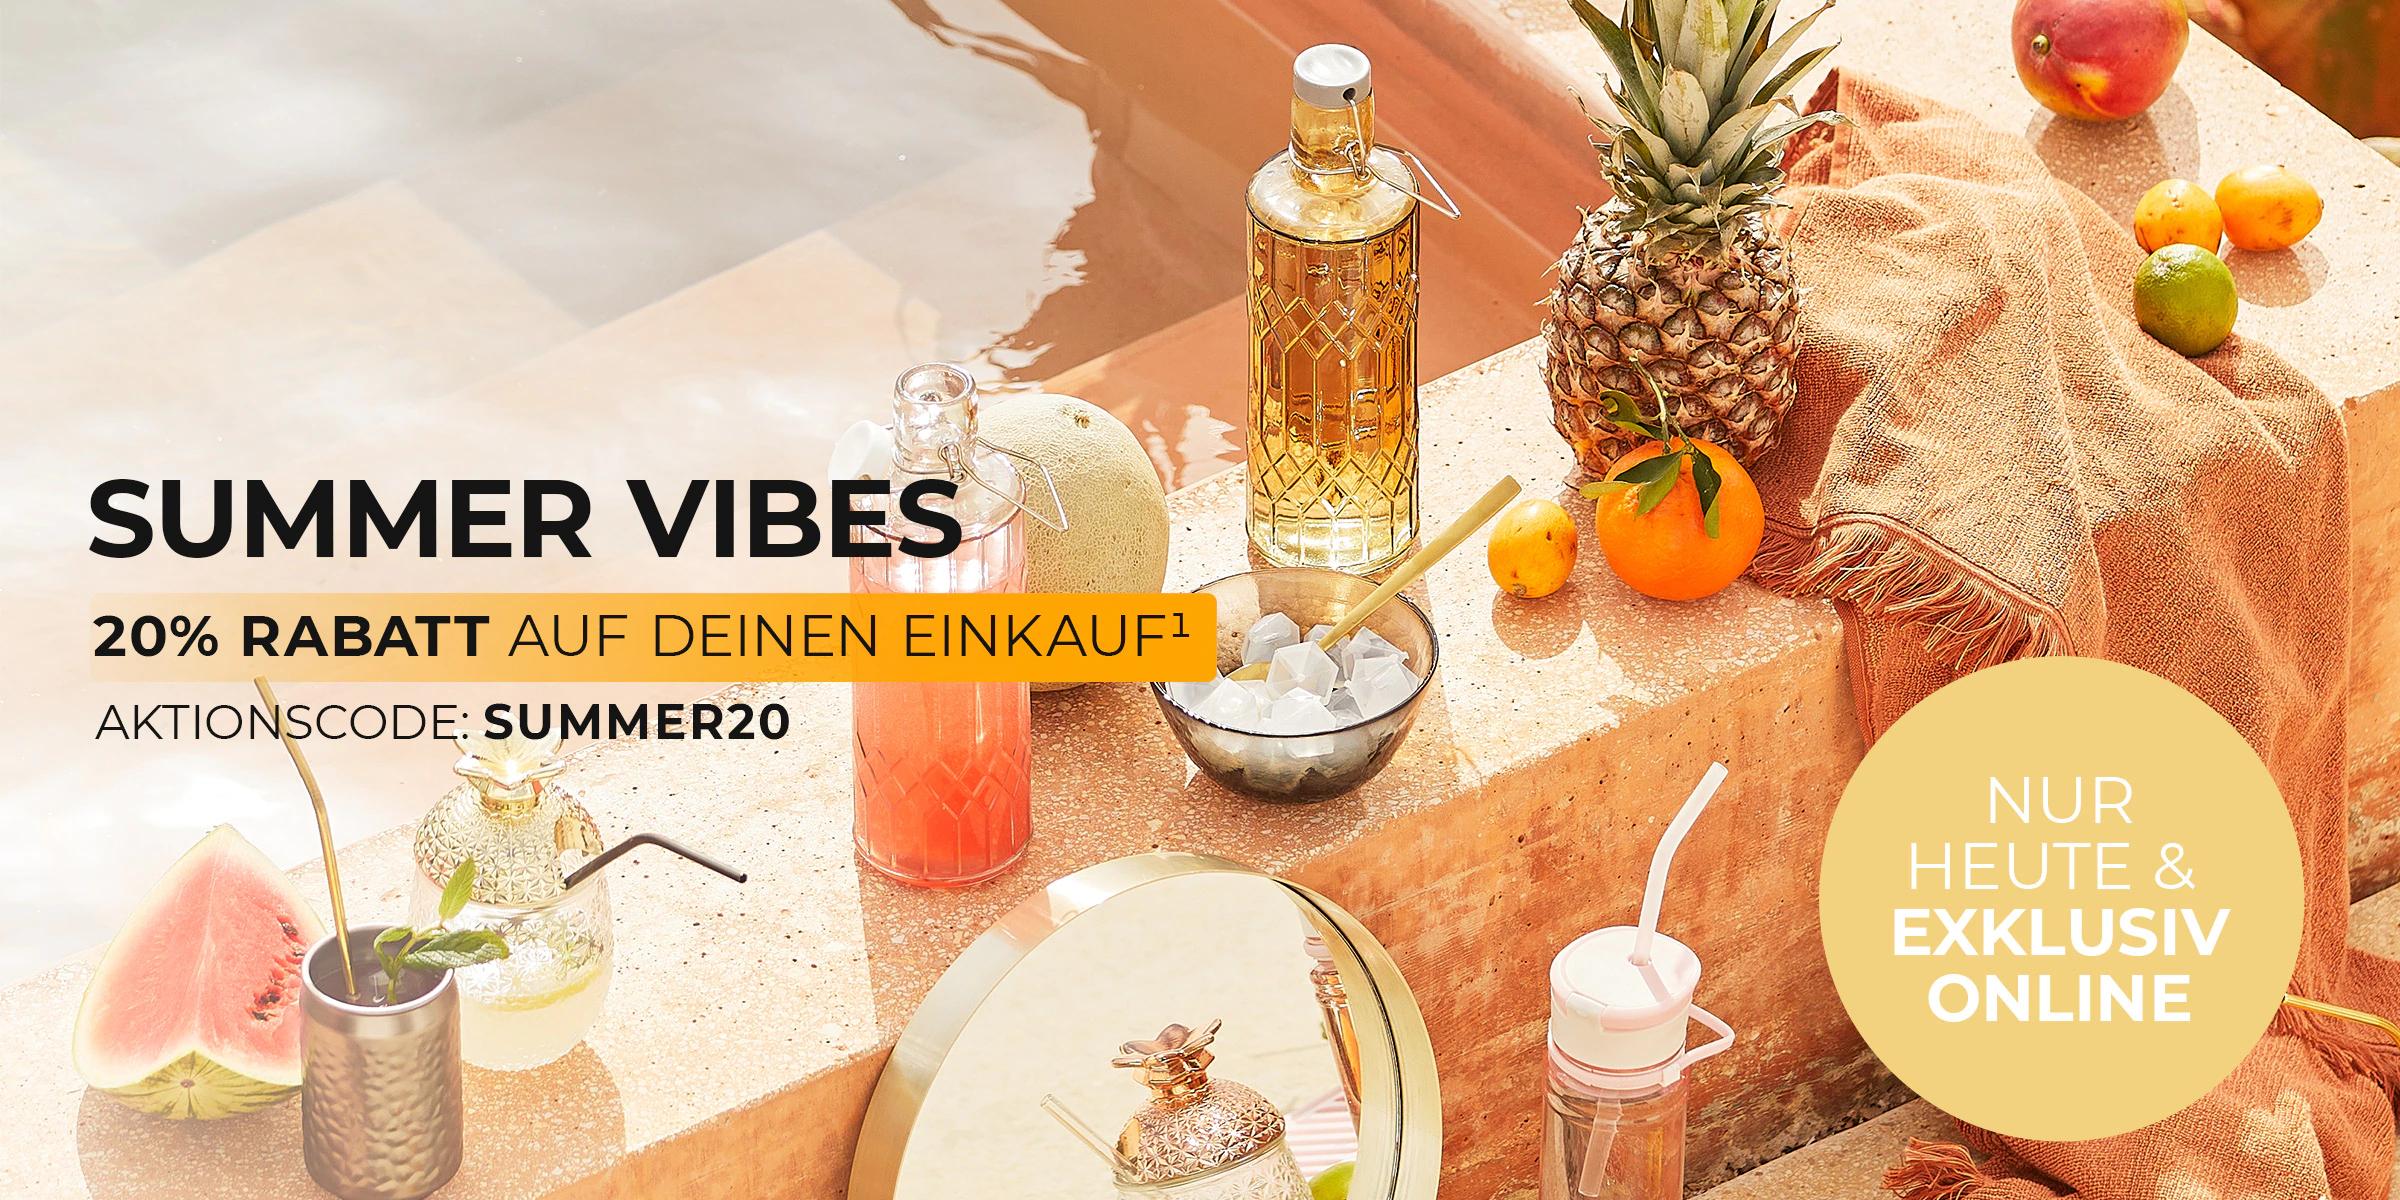 [Depot] Summer Vibes Sale - 20% Rabatt z.B. Sitzsack für 119,99€